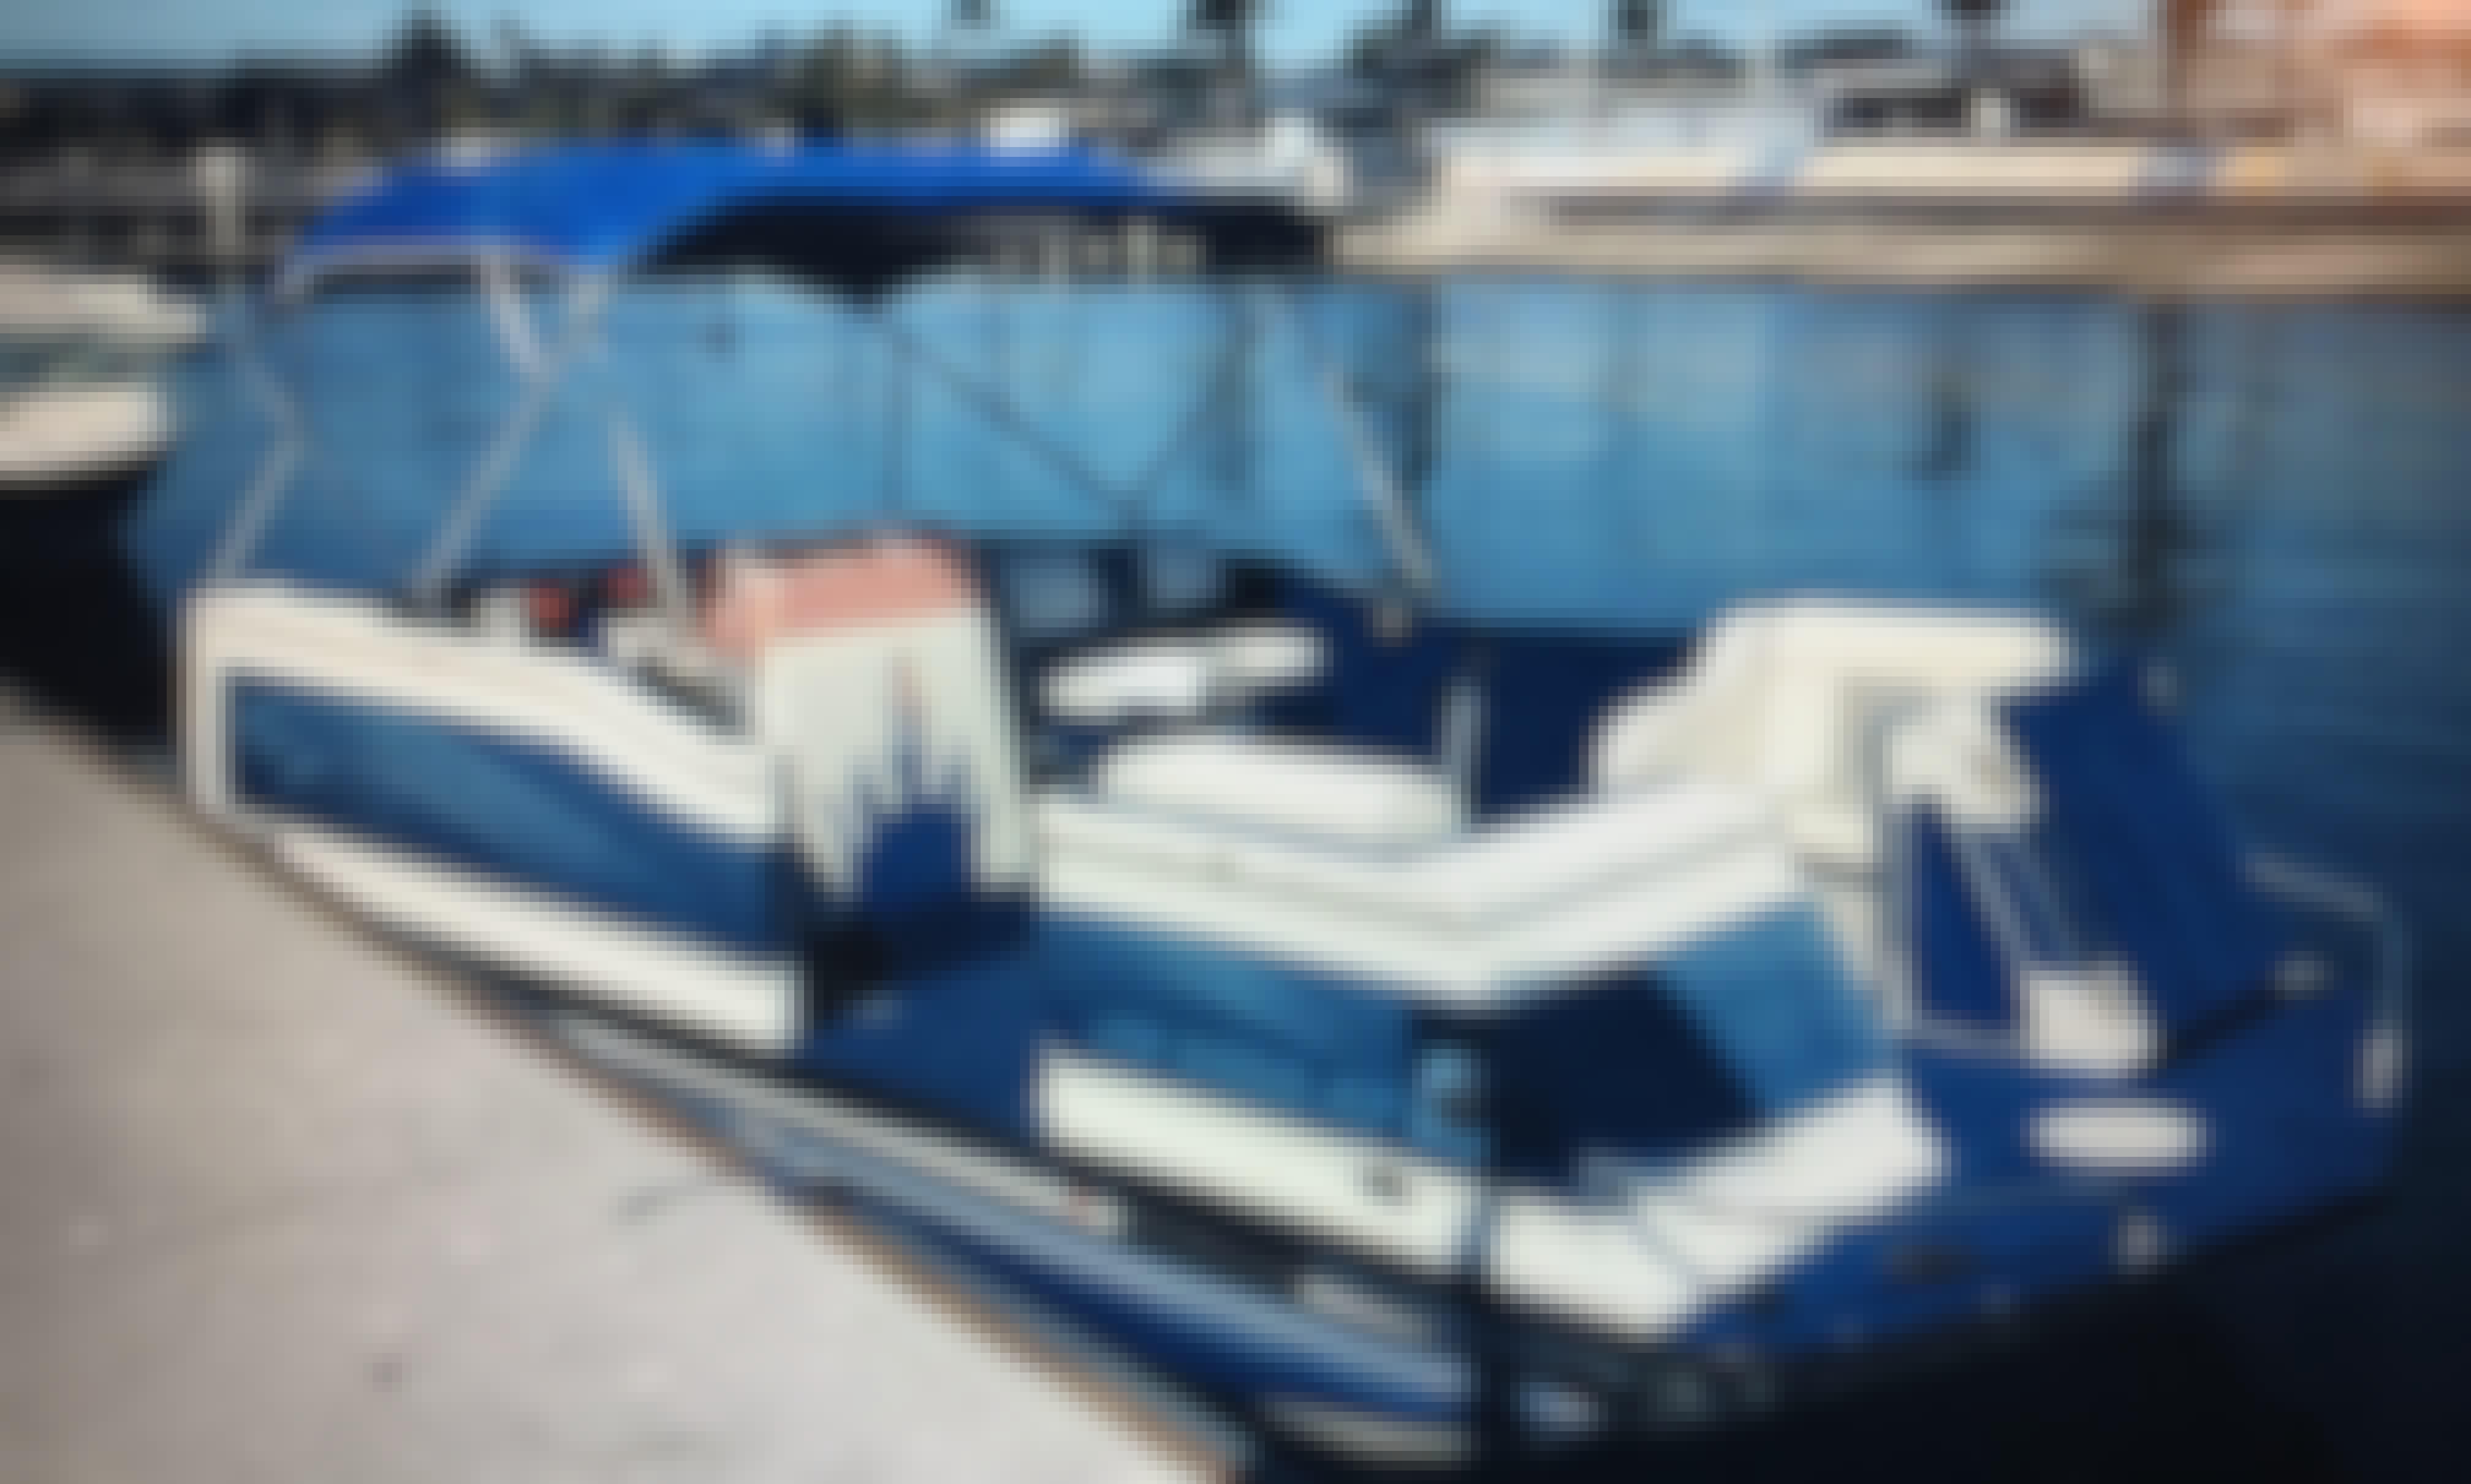 20' Ozark Deck Boat for Charter in Las Vegas